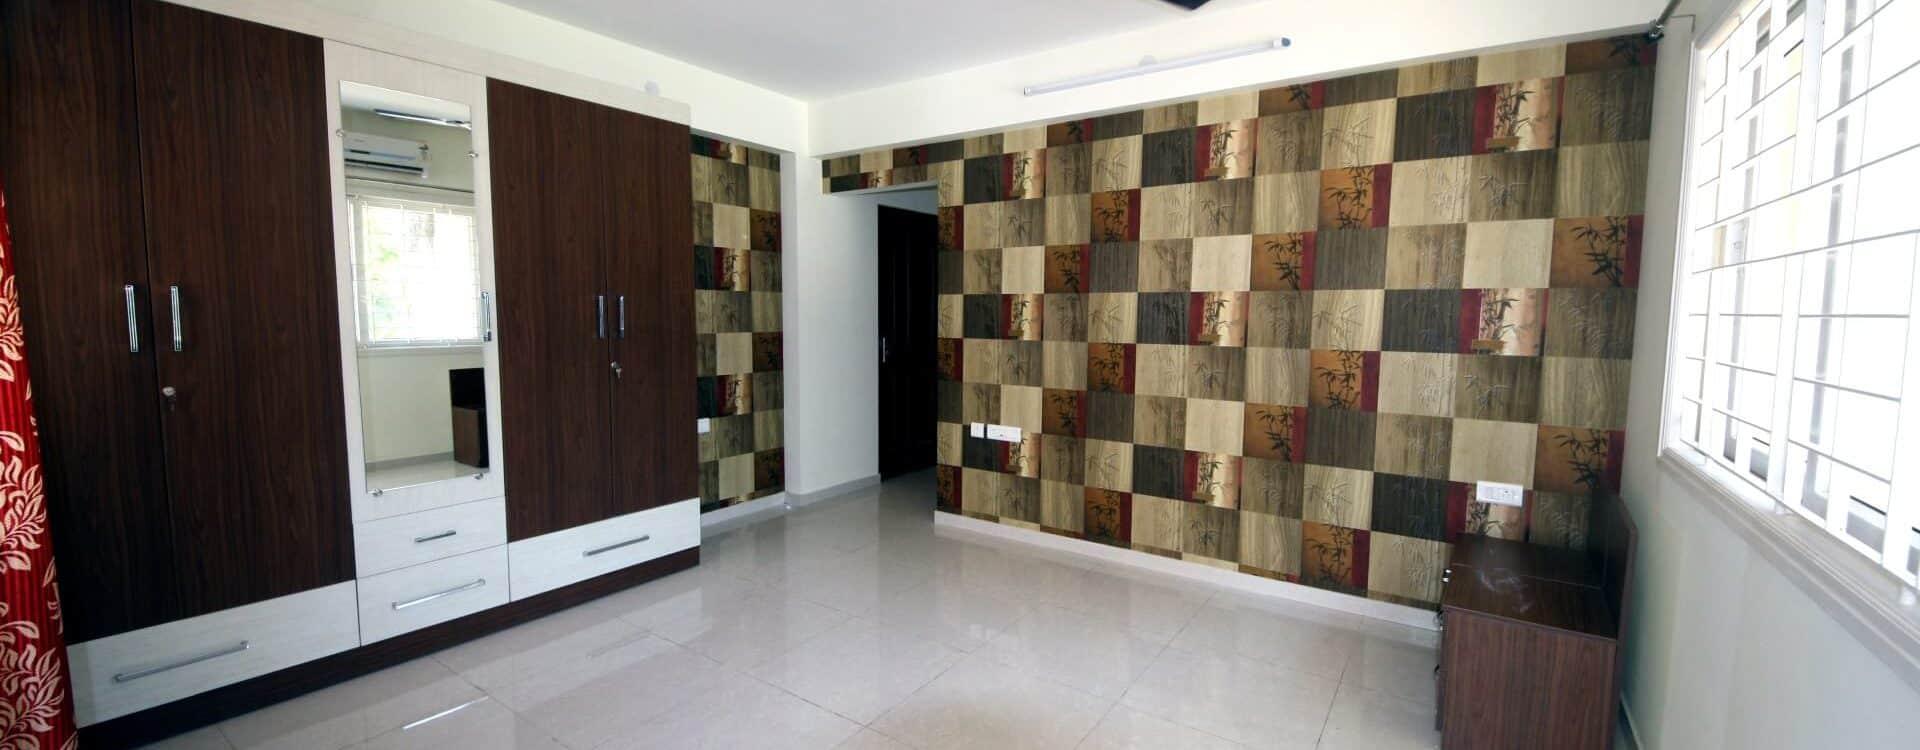 Mr. Prashant Kulkarni's Residence at Matrix Tranquil Apartment, Bejai, Mangalore